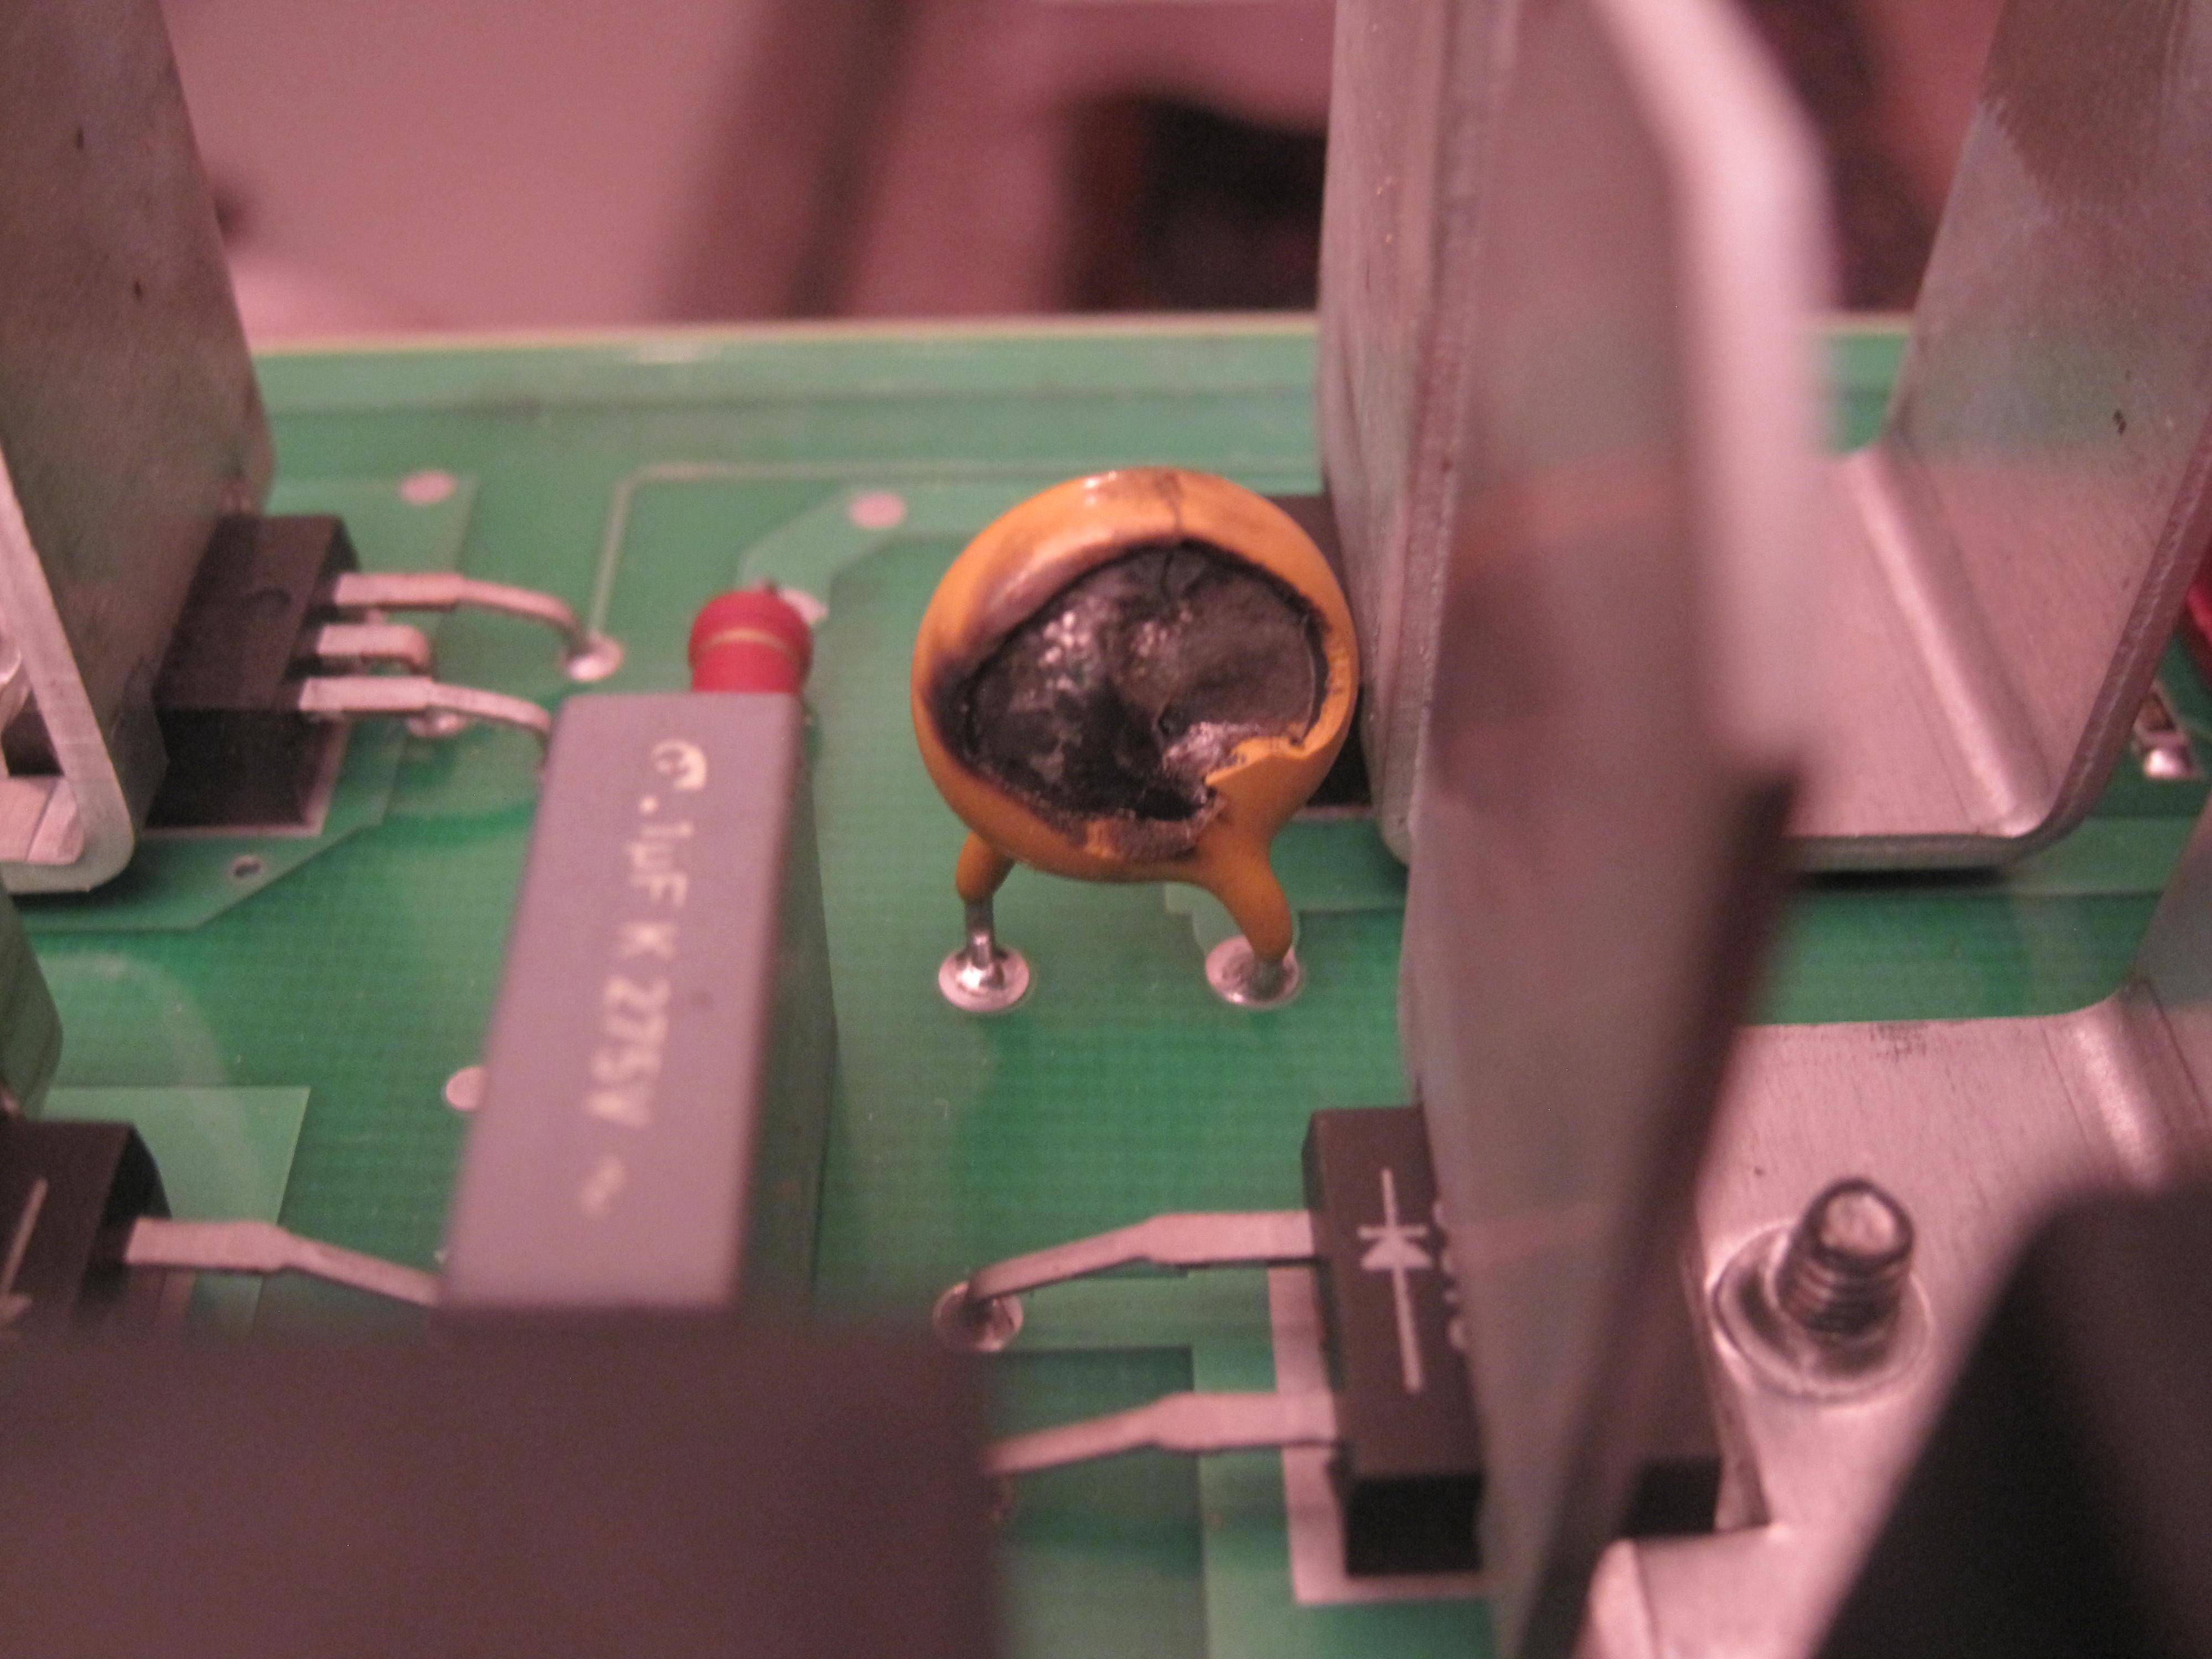 miele novo eco w806 spalony kondensator. Black Bedroom Furniture Sets. Home Design Ideas